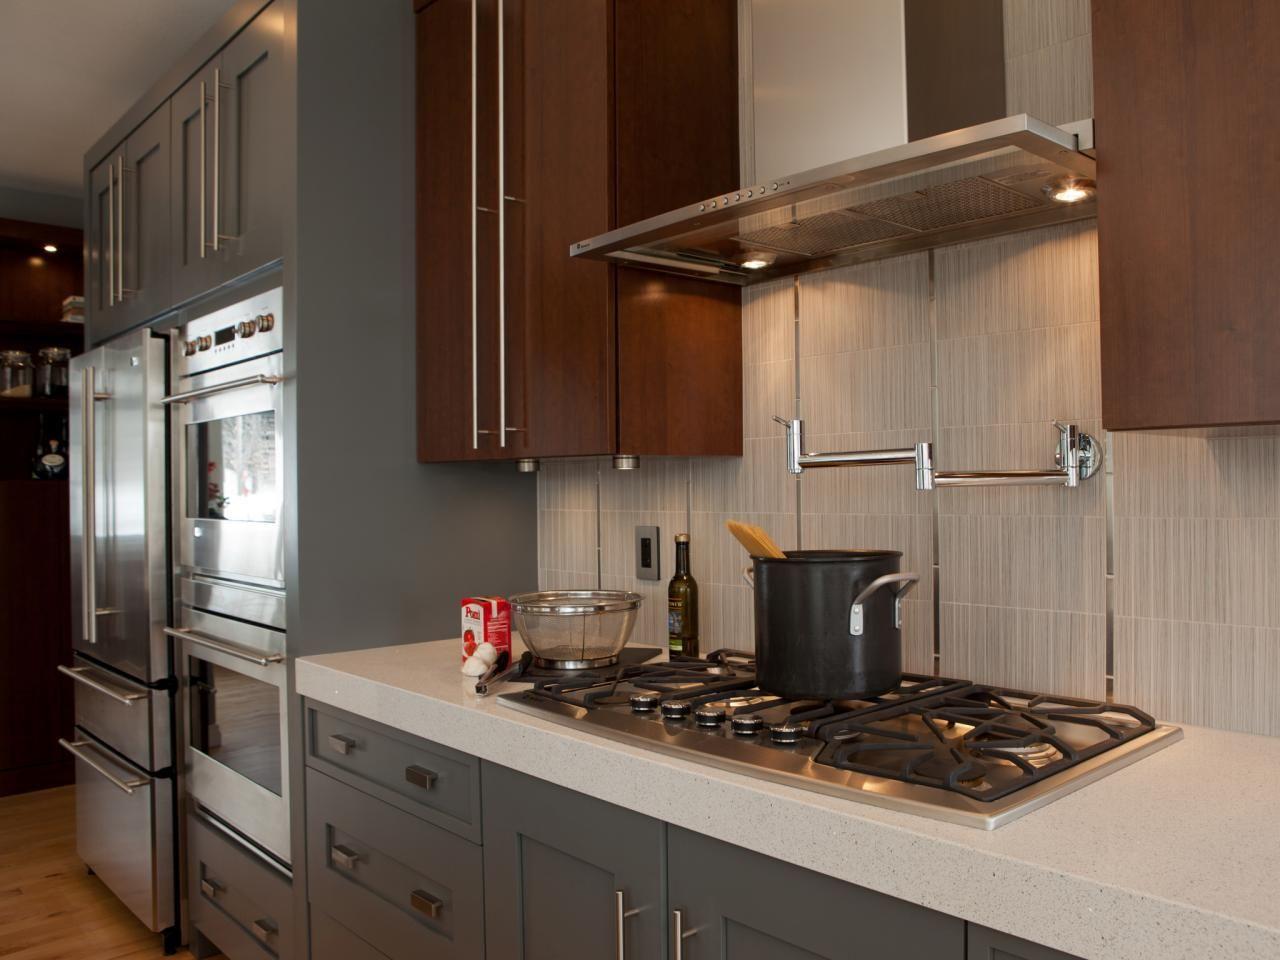 Uncategorized Vertical Subway Tile Backsplash 20 stainless steel kitchen backsplashes backsplash backsplashes